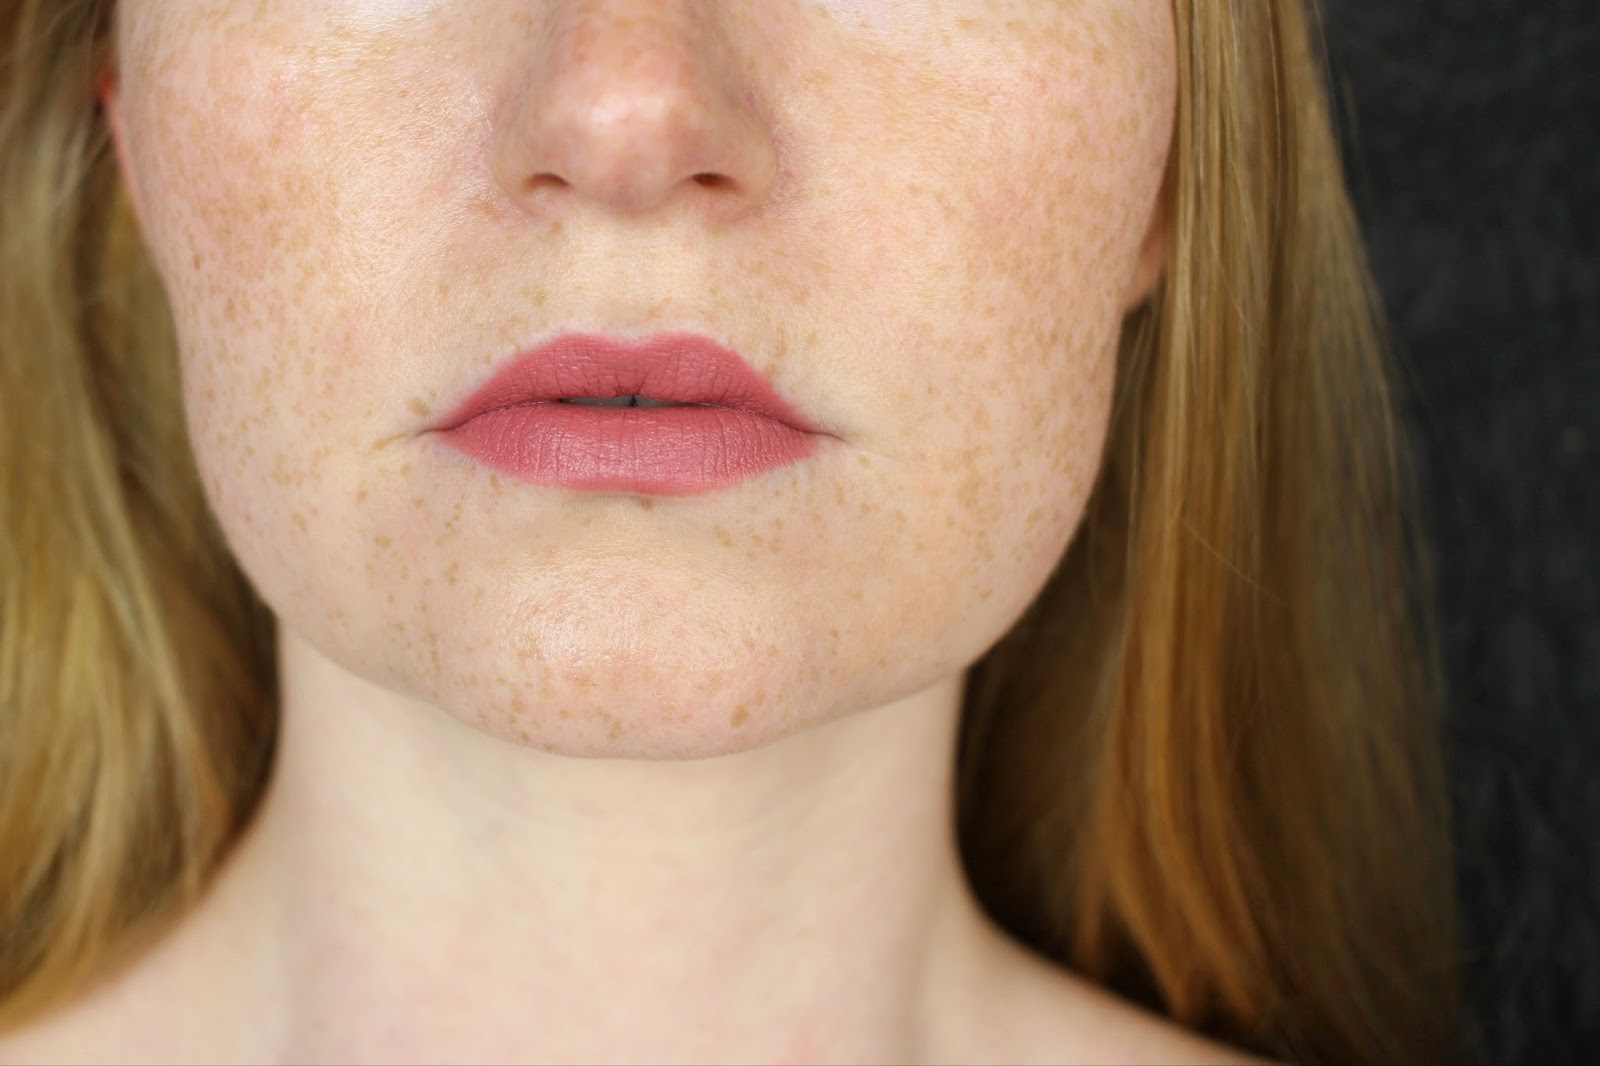 2016, CATRICE, drogerie, favoriten, herbst, lippenstift, lipstick, matt 6hr Lip Artist, mattes finish, neues sortiment, nude, ohne auszutrocknen, review, rosa, rot, rote lippen, swatches, tragebilder, trendfarben,